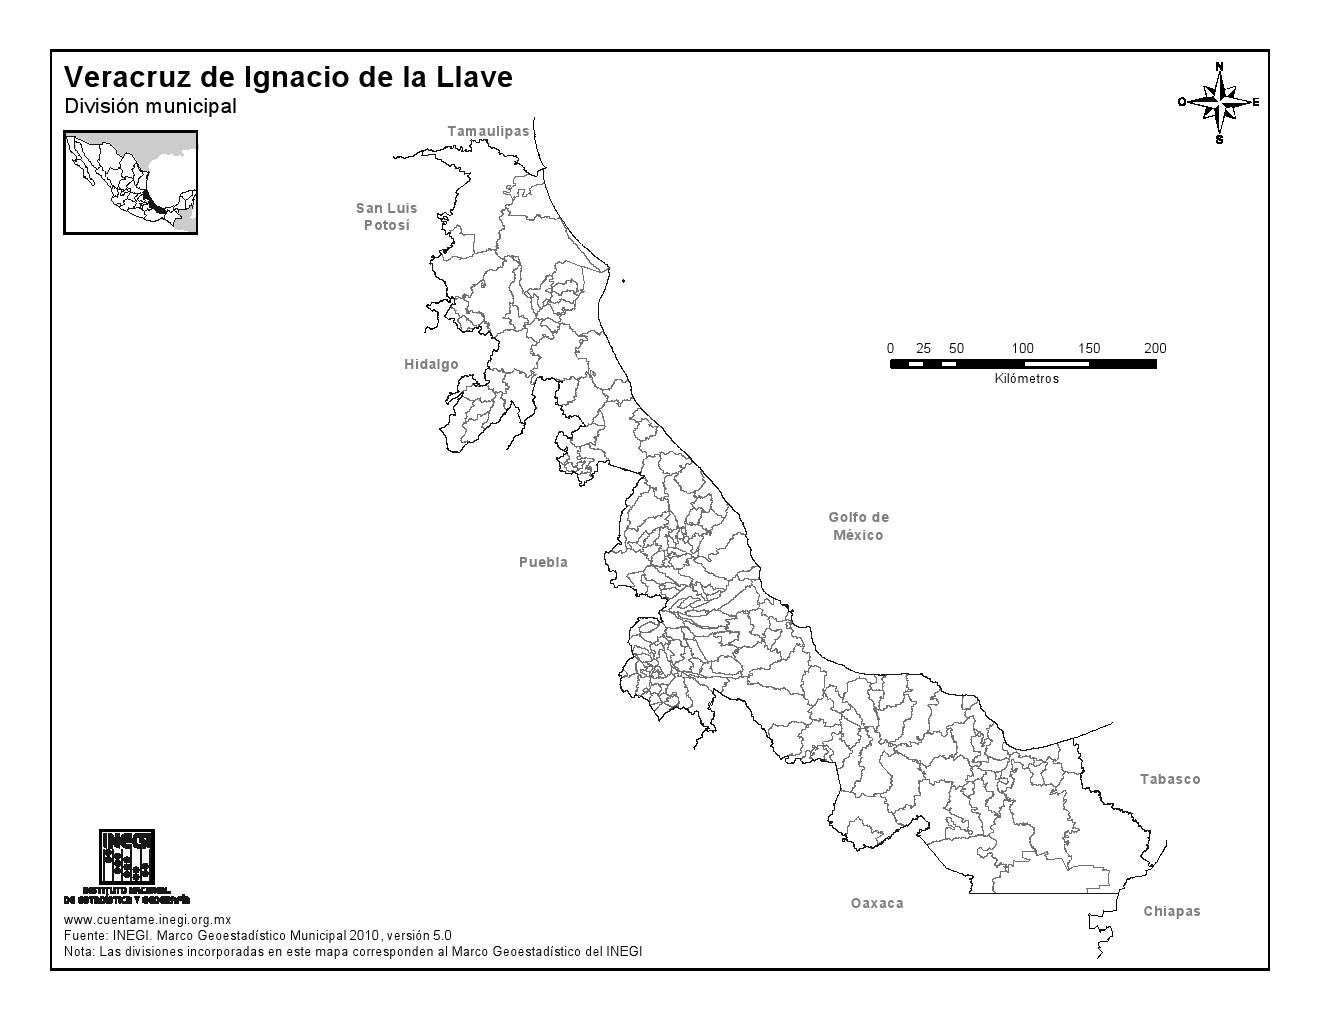 Mapa mudo de municipios de Veracruz. INEGI de México